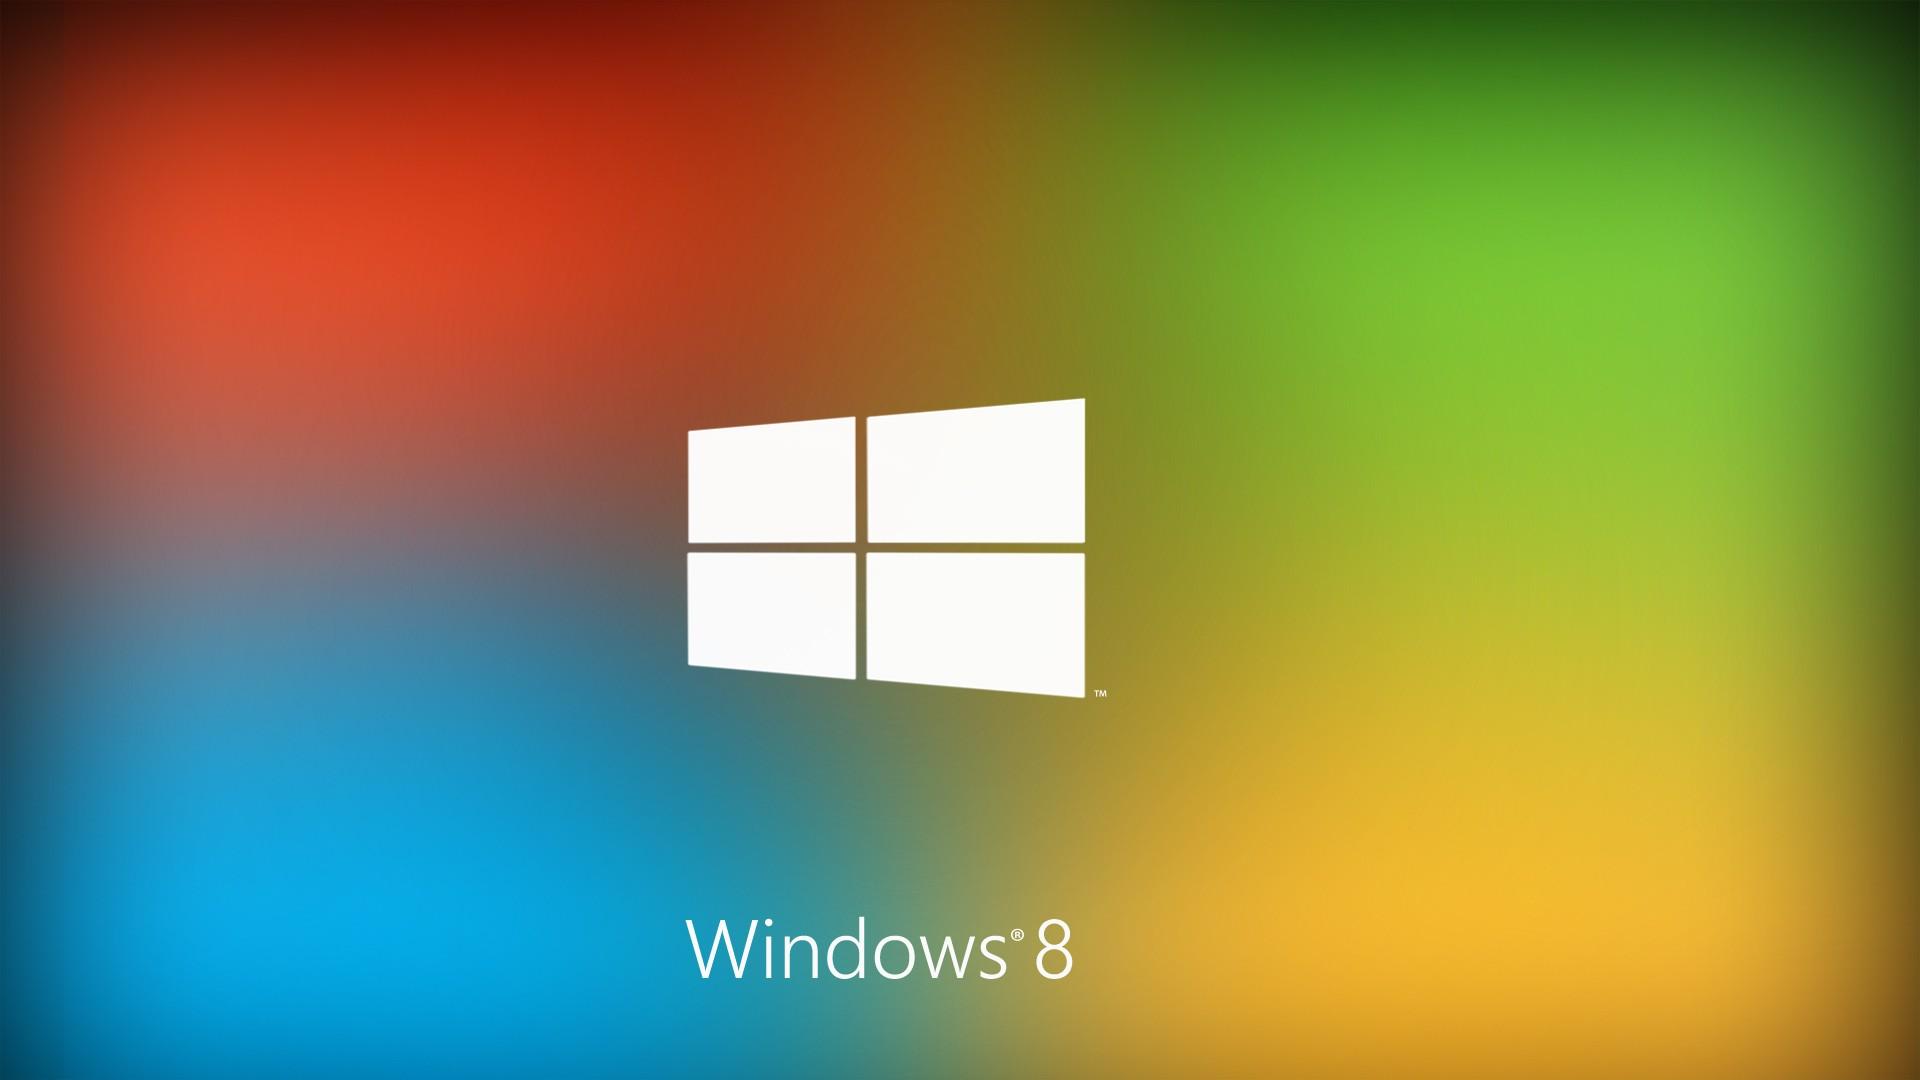 Windows 8 Permanent Activator with Two Alternative Methods